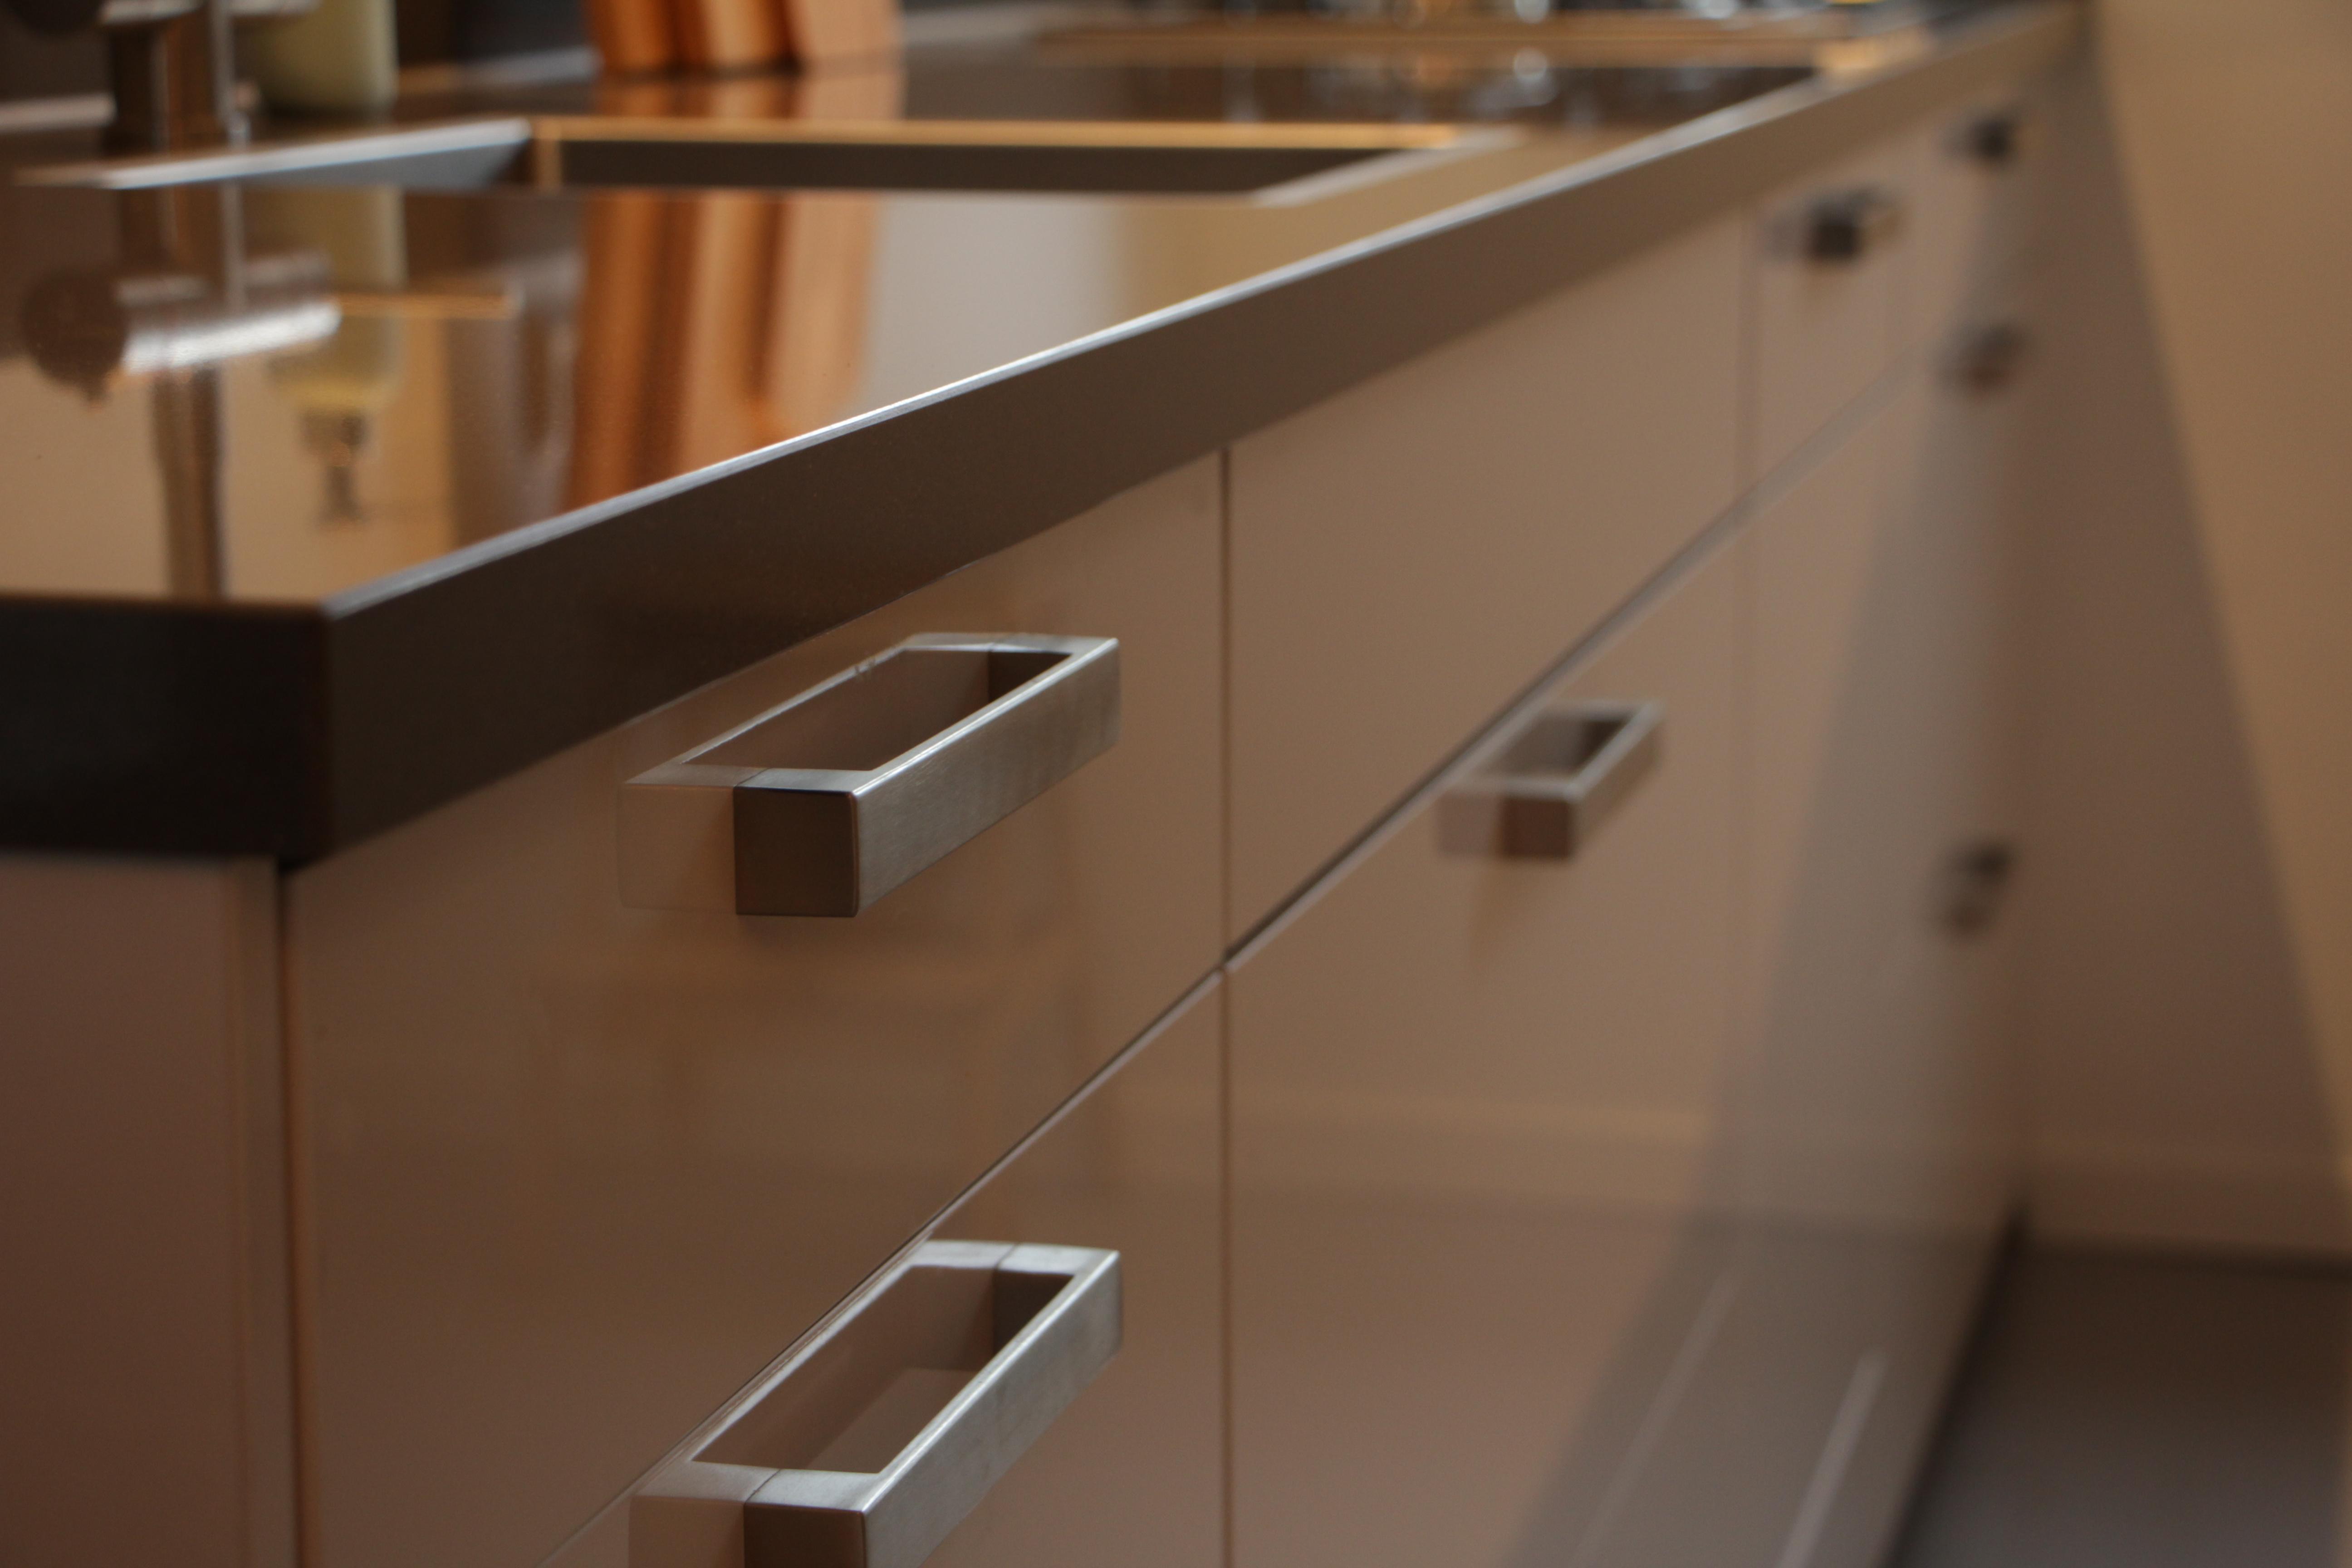 Badkamer Plafond Afsteken : Badkamer toilet en keuken in amersfoort